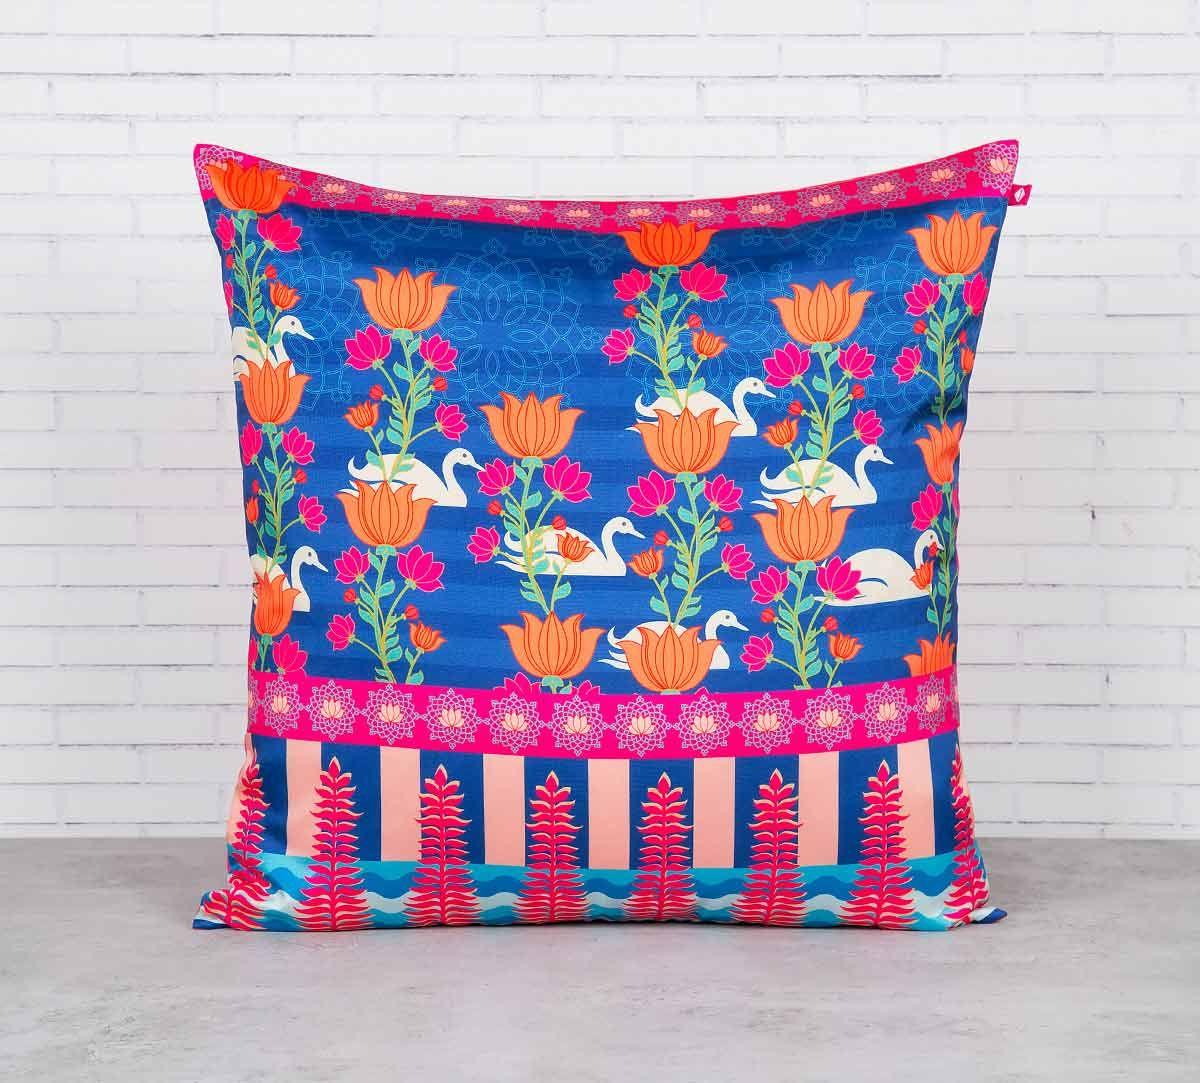 India Circus Abies Alba Lotus Duck Pond Blended Taf Silk Cushion Cover